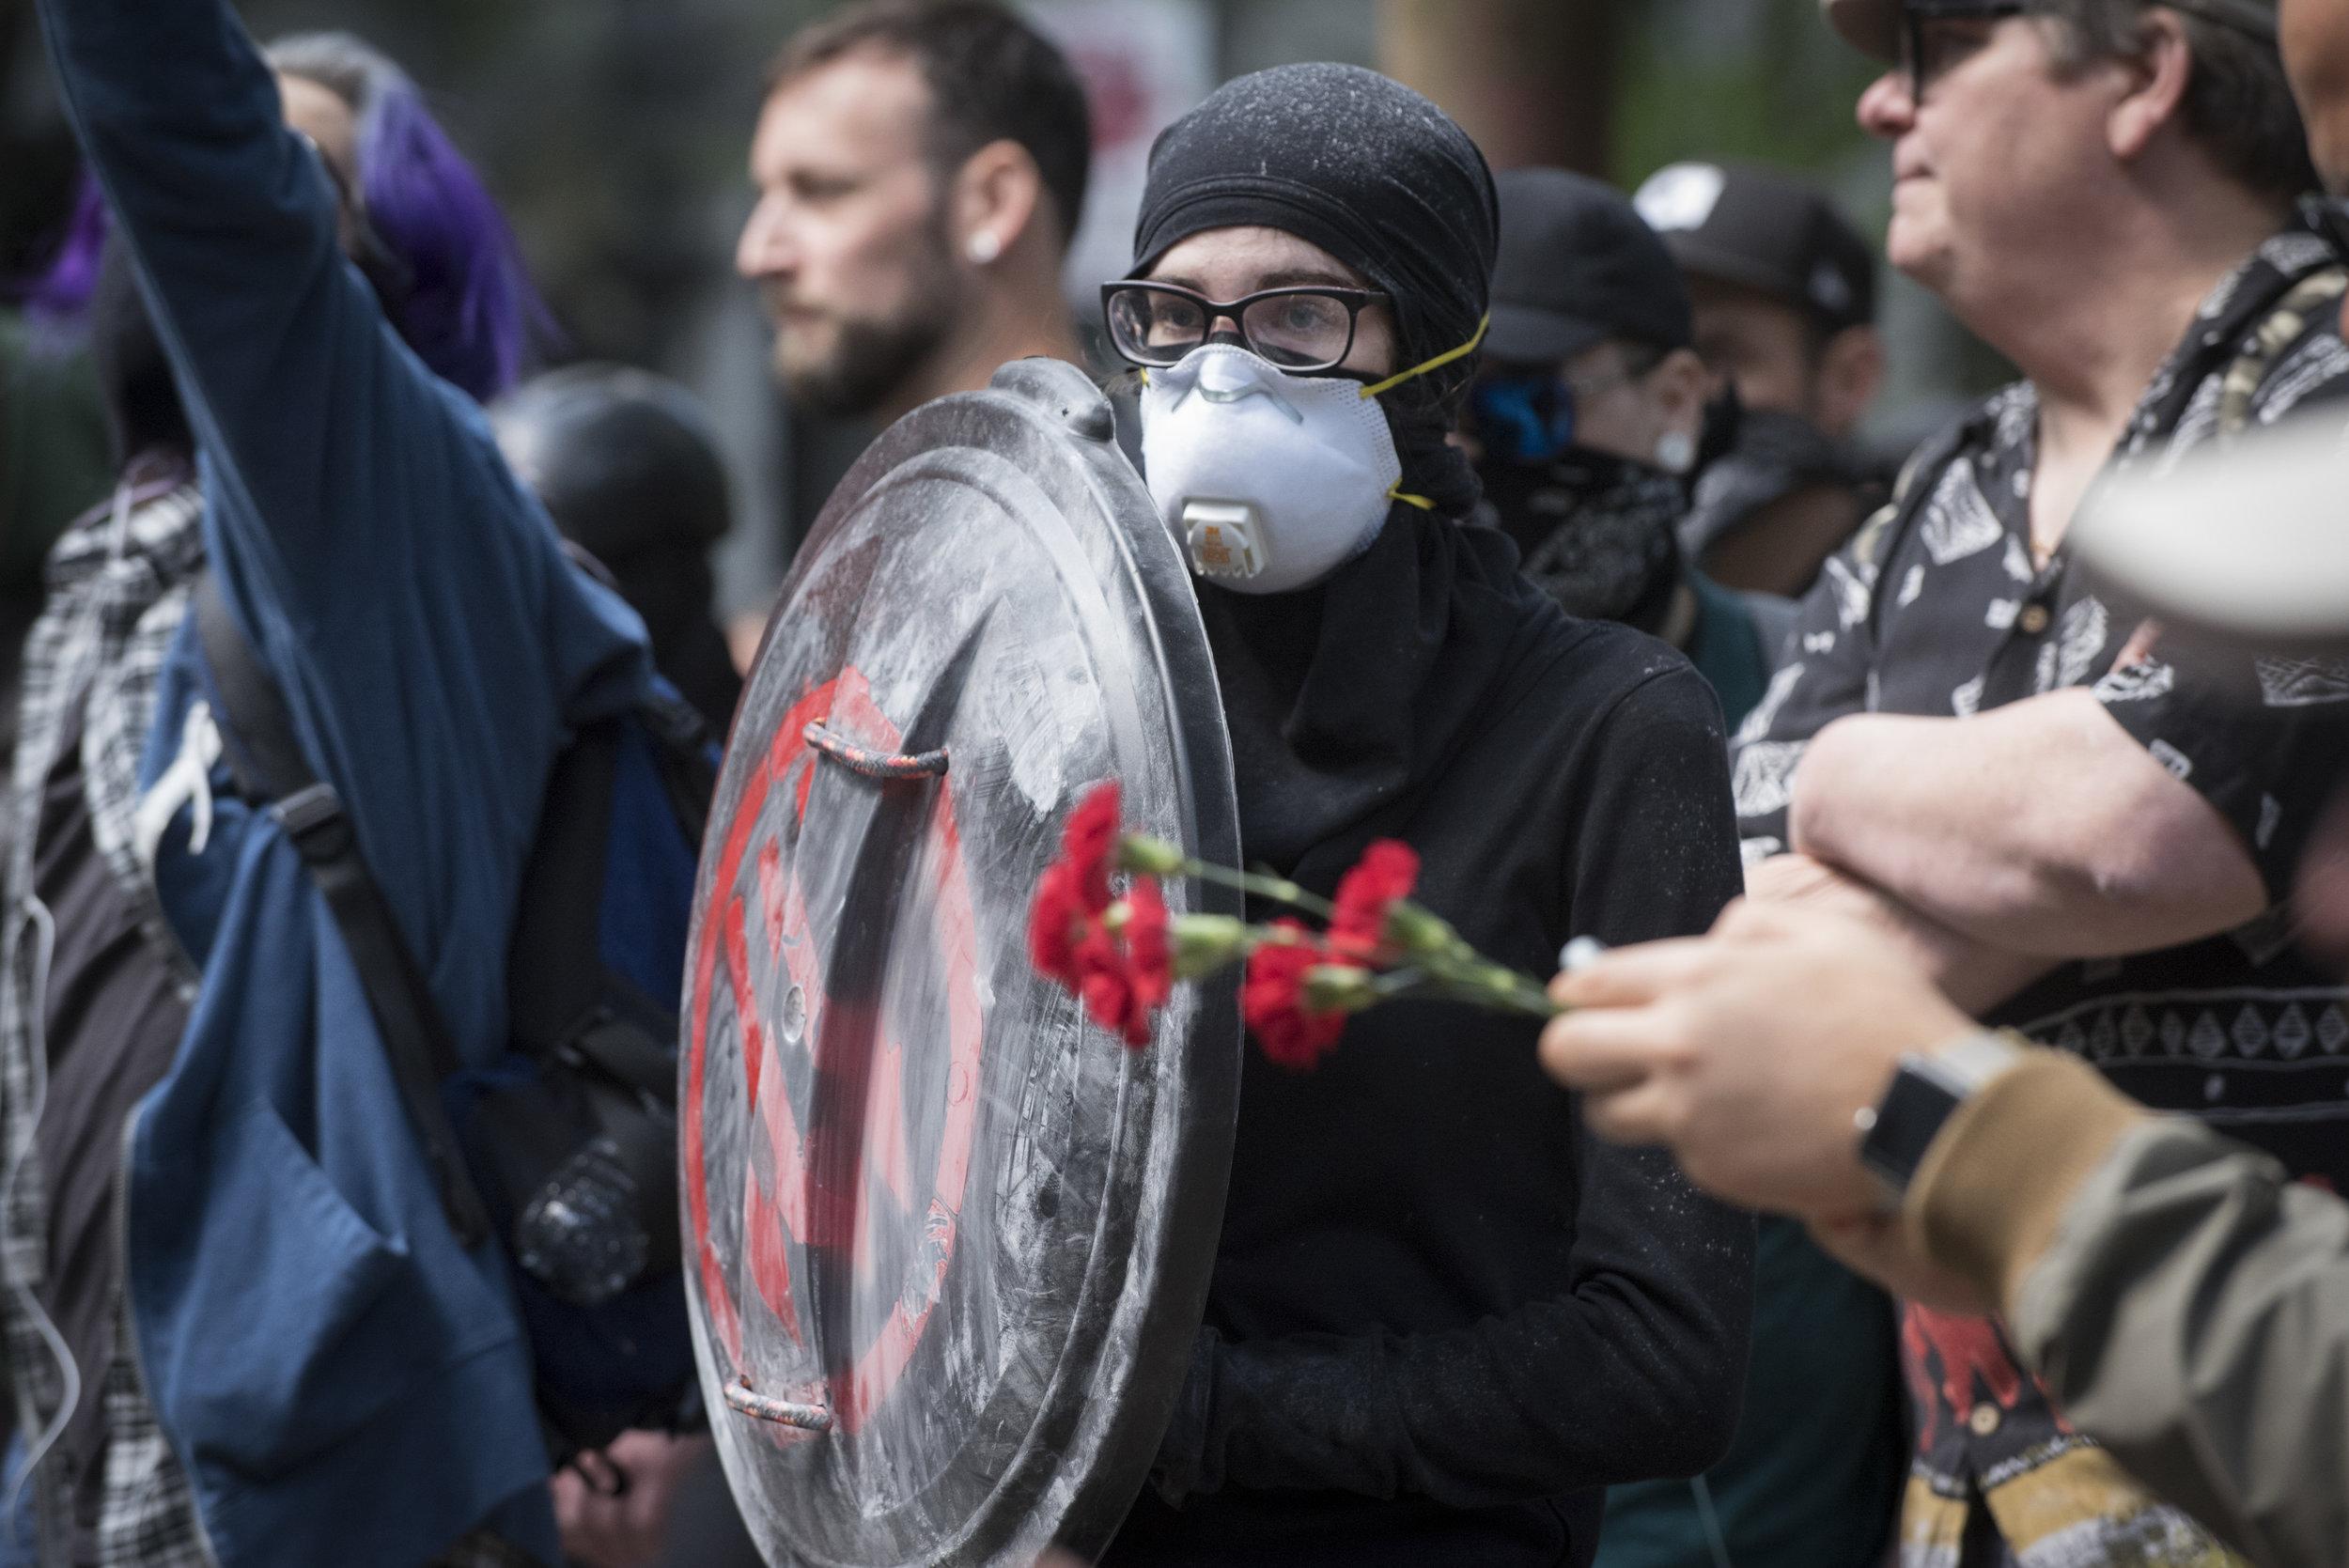 Portland_Rally_6.4.17_03.jpg